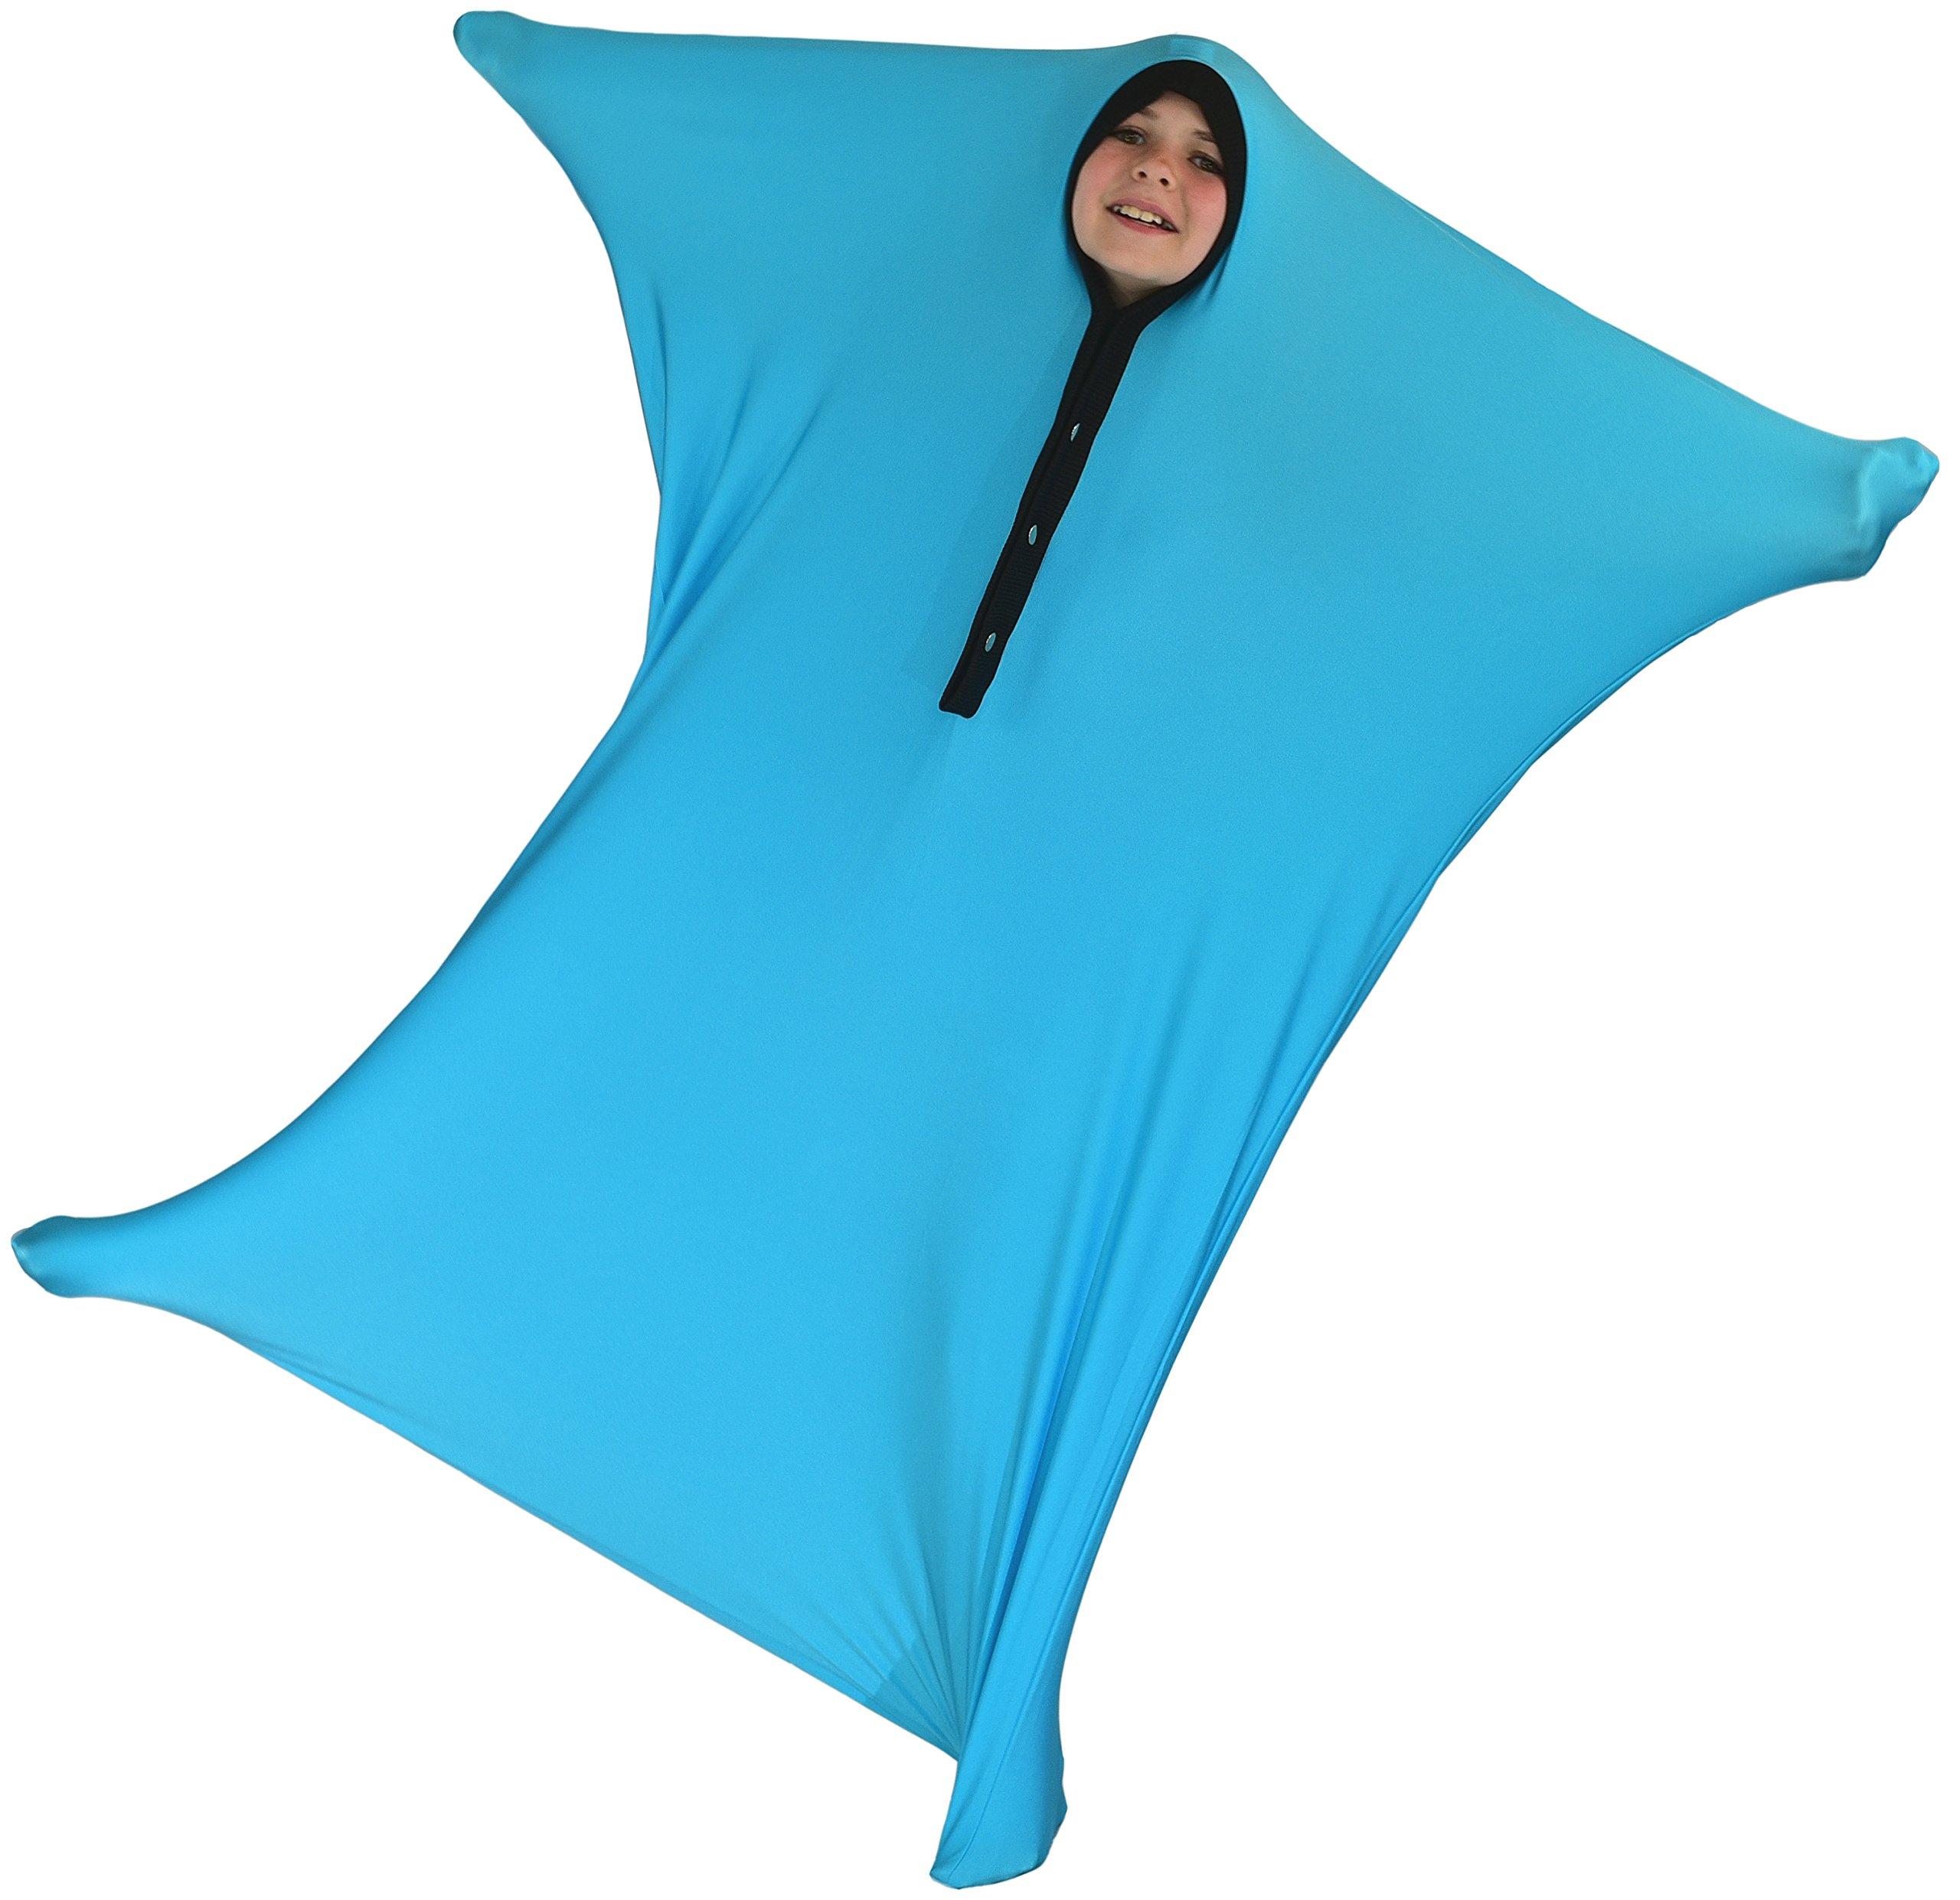 ZZZ Weighted Blankets Sensory Sack, Sensory Sock, Body Sock (Blue, Large (9-13))